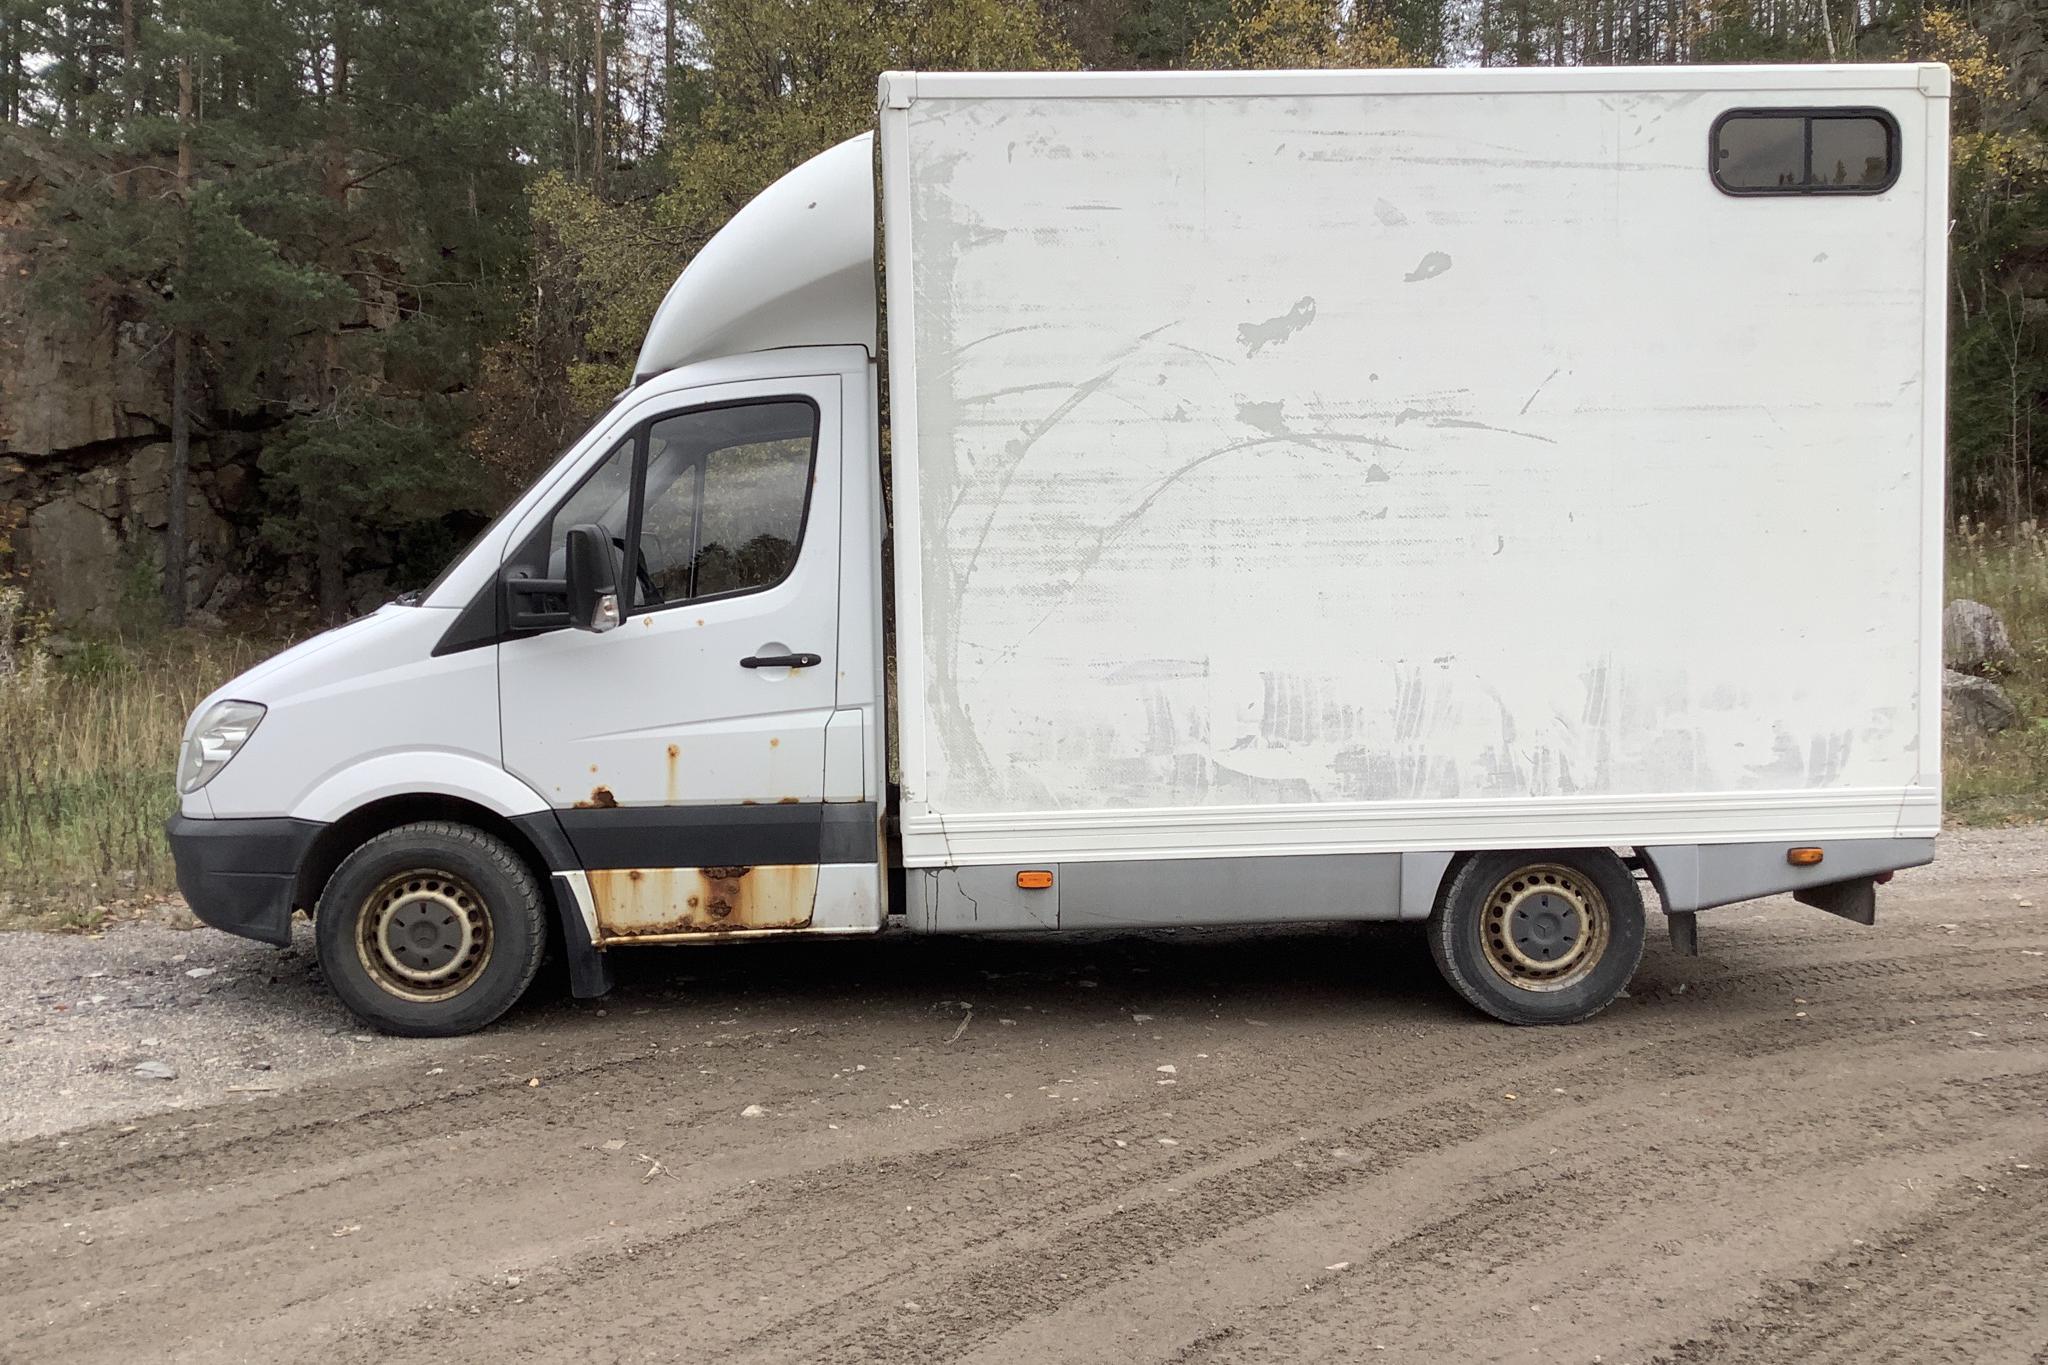 Mercedes Sprinter 315 CDI Hästtransport - 25 357 mil - Manuell - vit - 2009